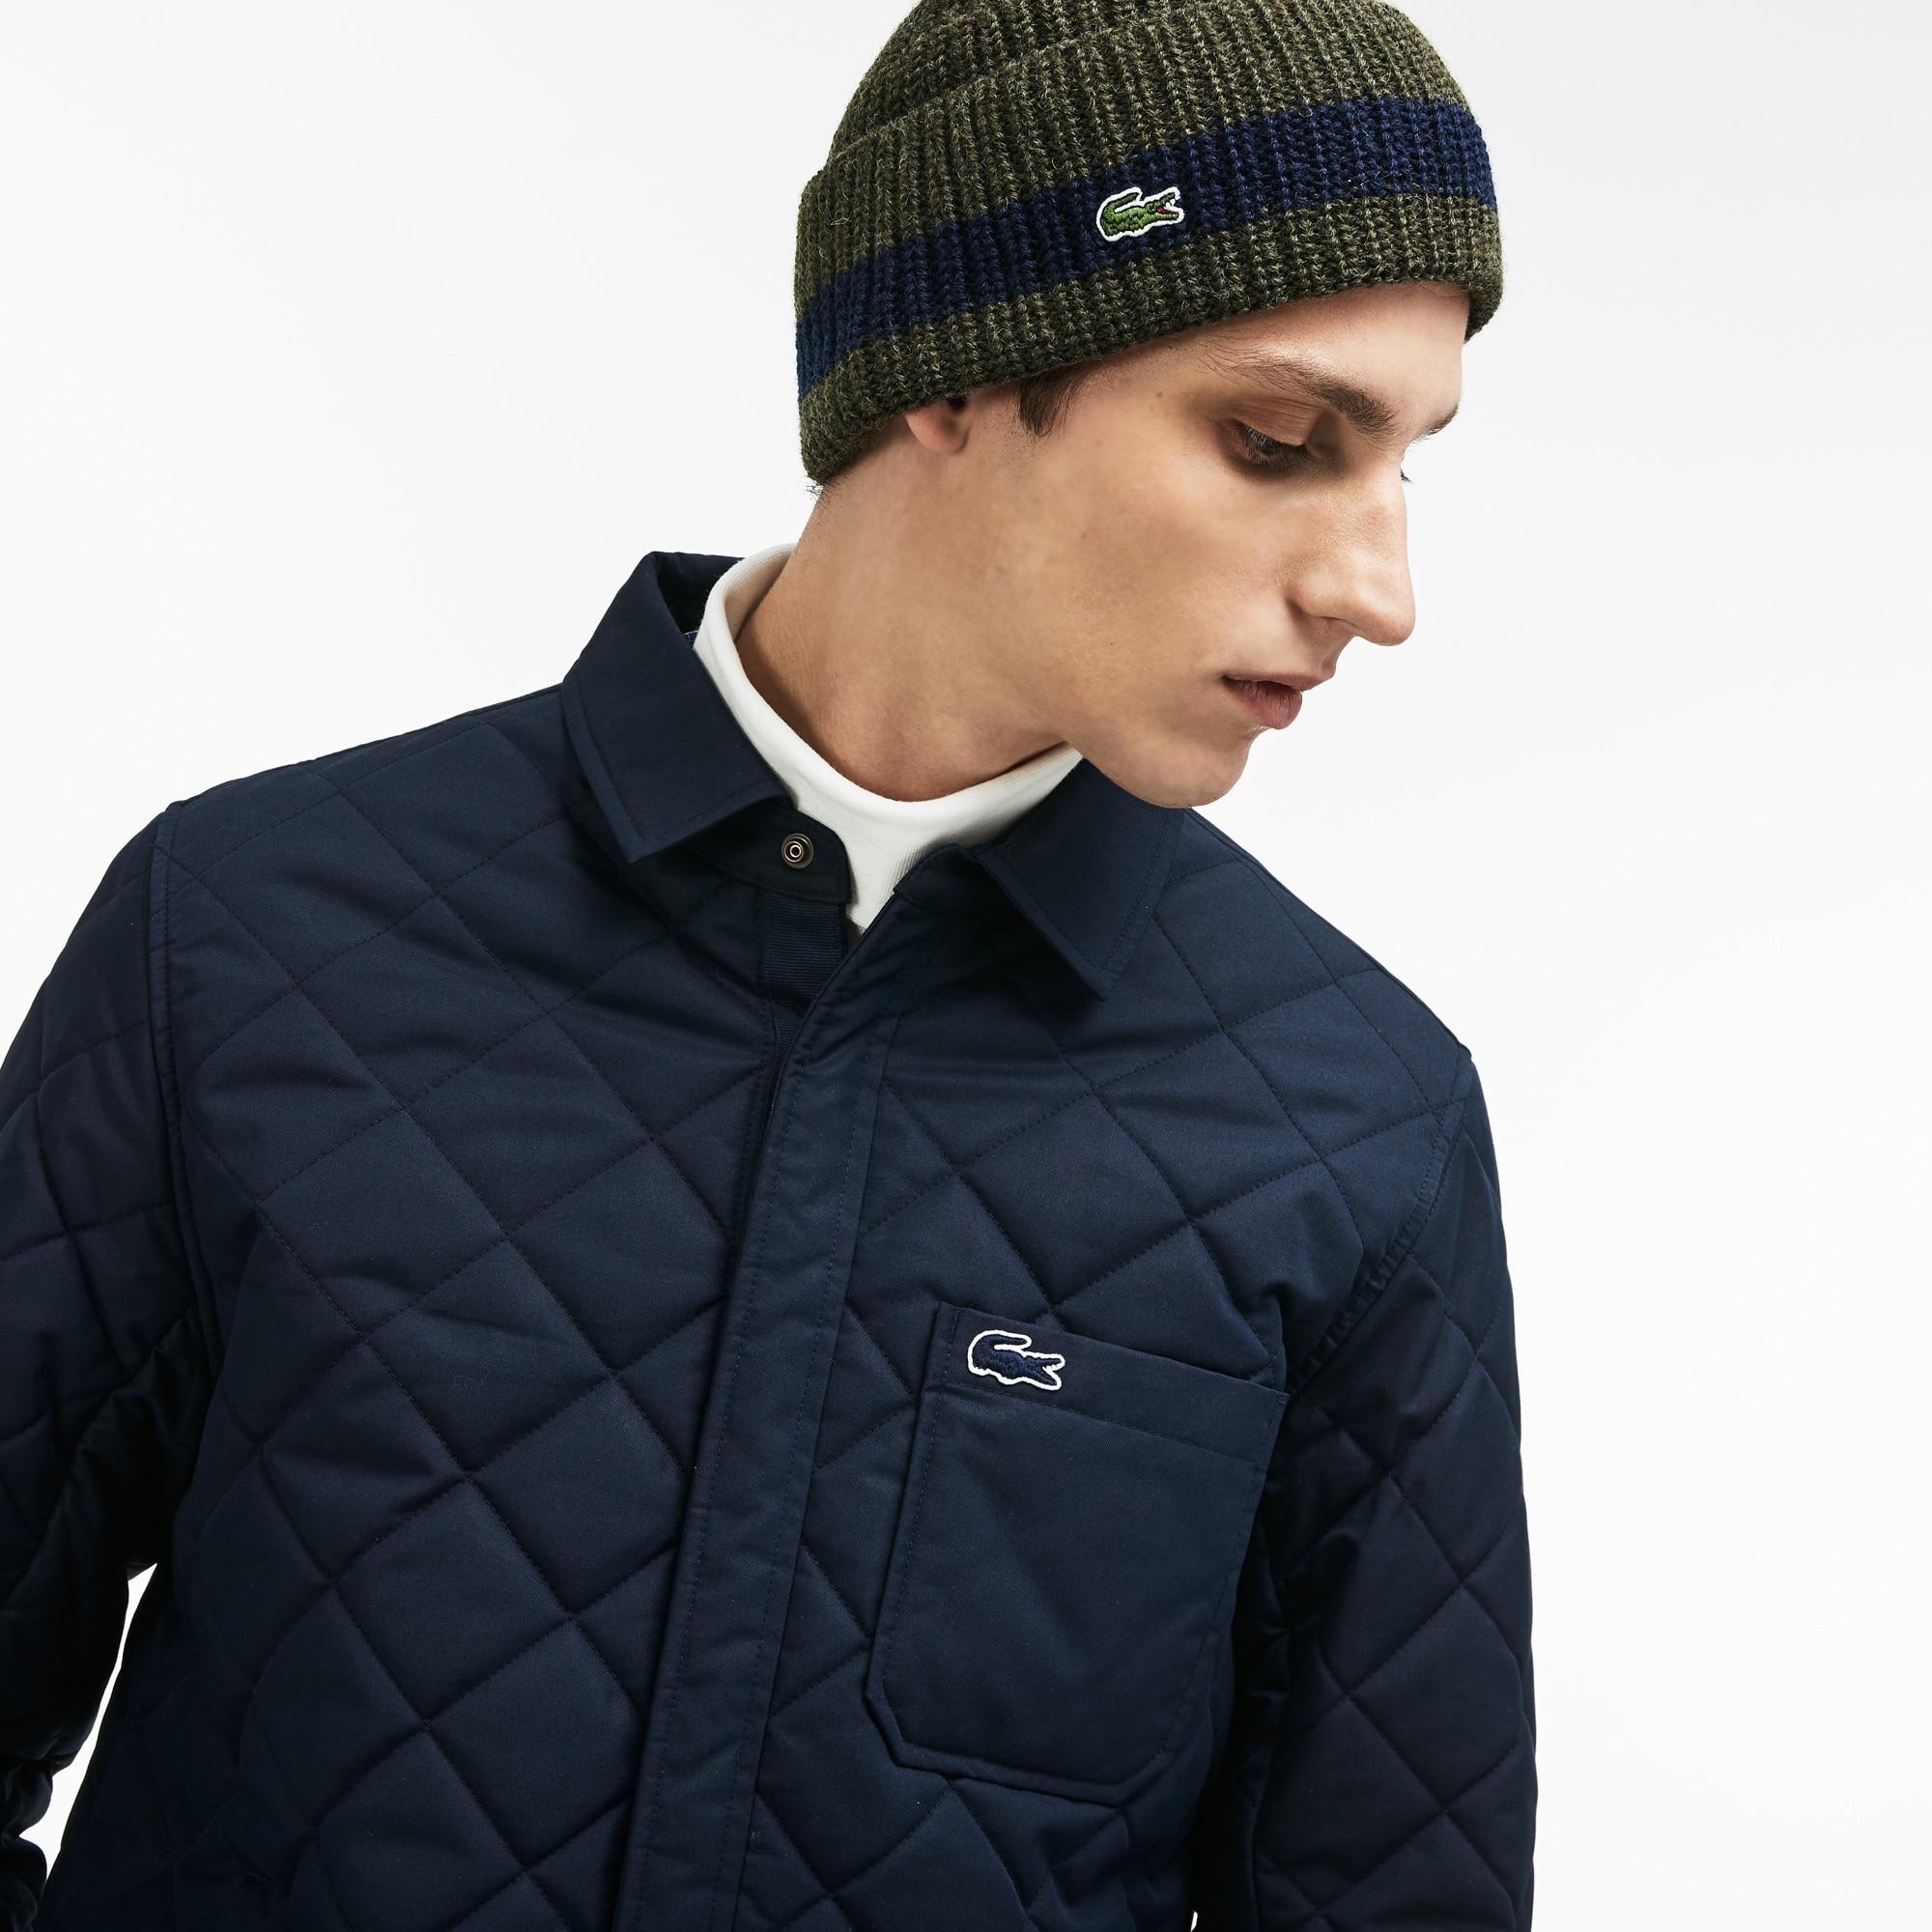 Men's Turned Edge Ribbed Wool Beanie